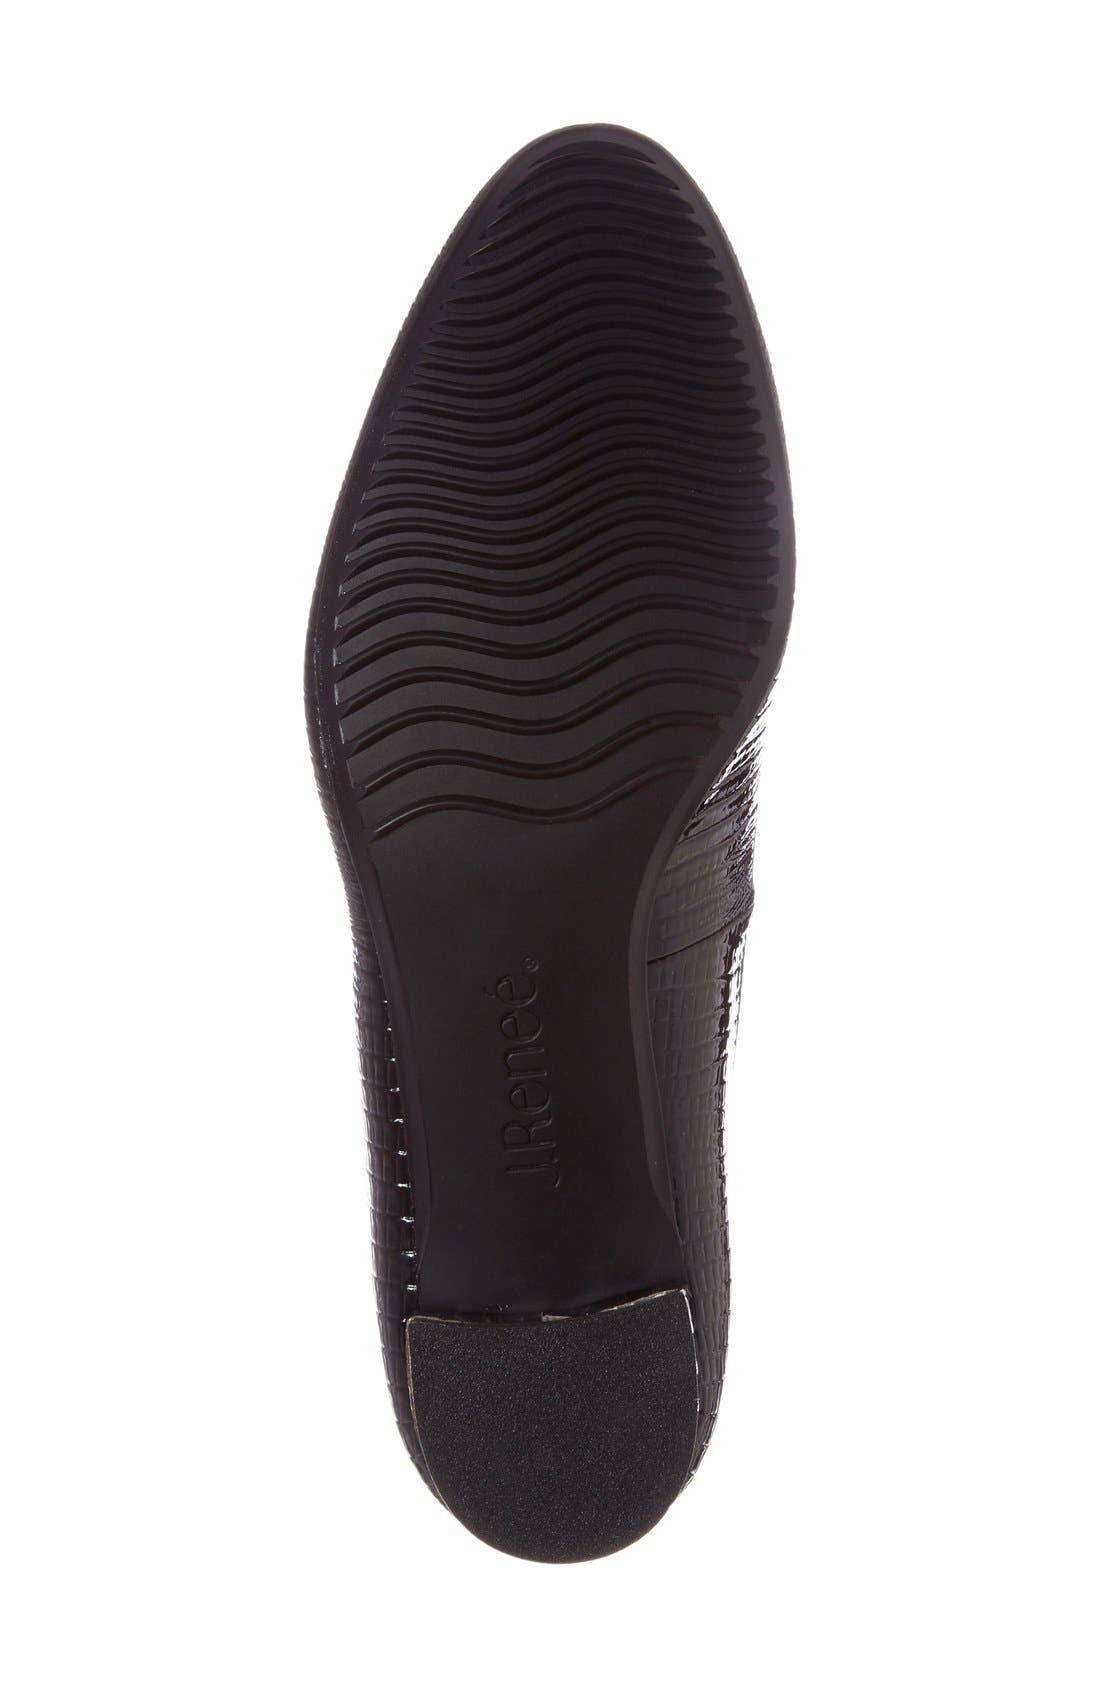 Bambalina Block Heel Pump,                             Alternate thumbnail 4, color,                             BLACK FAUX LEATHER